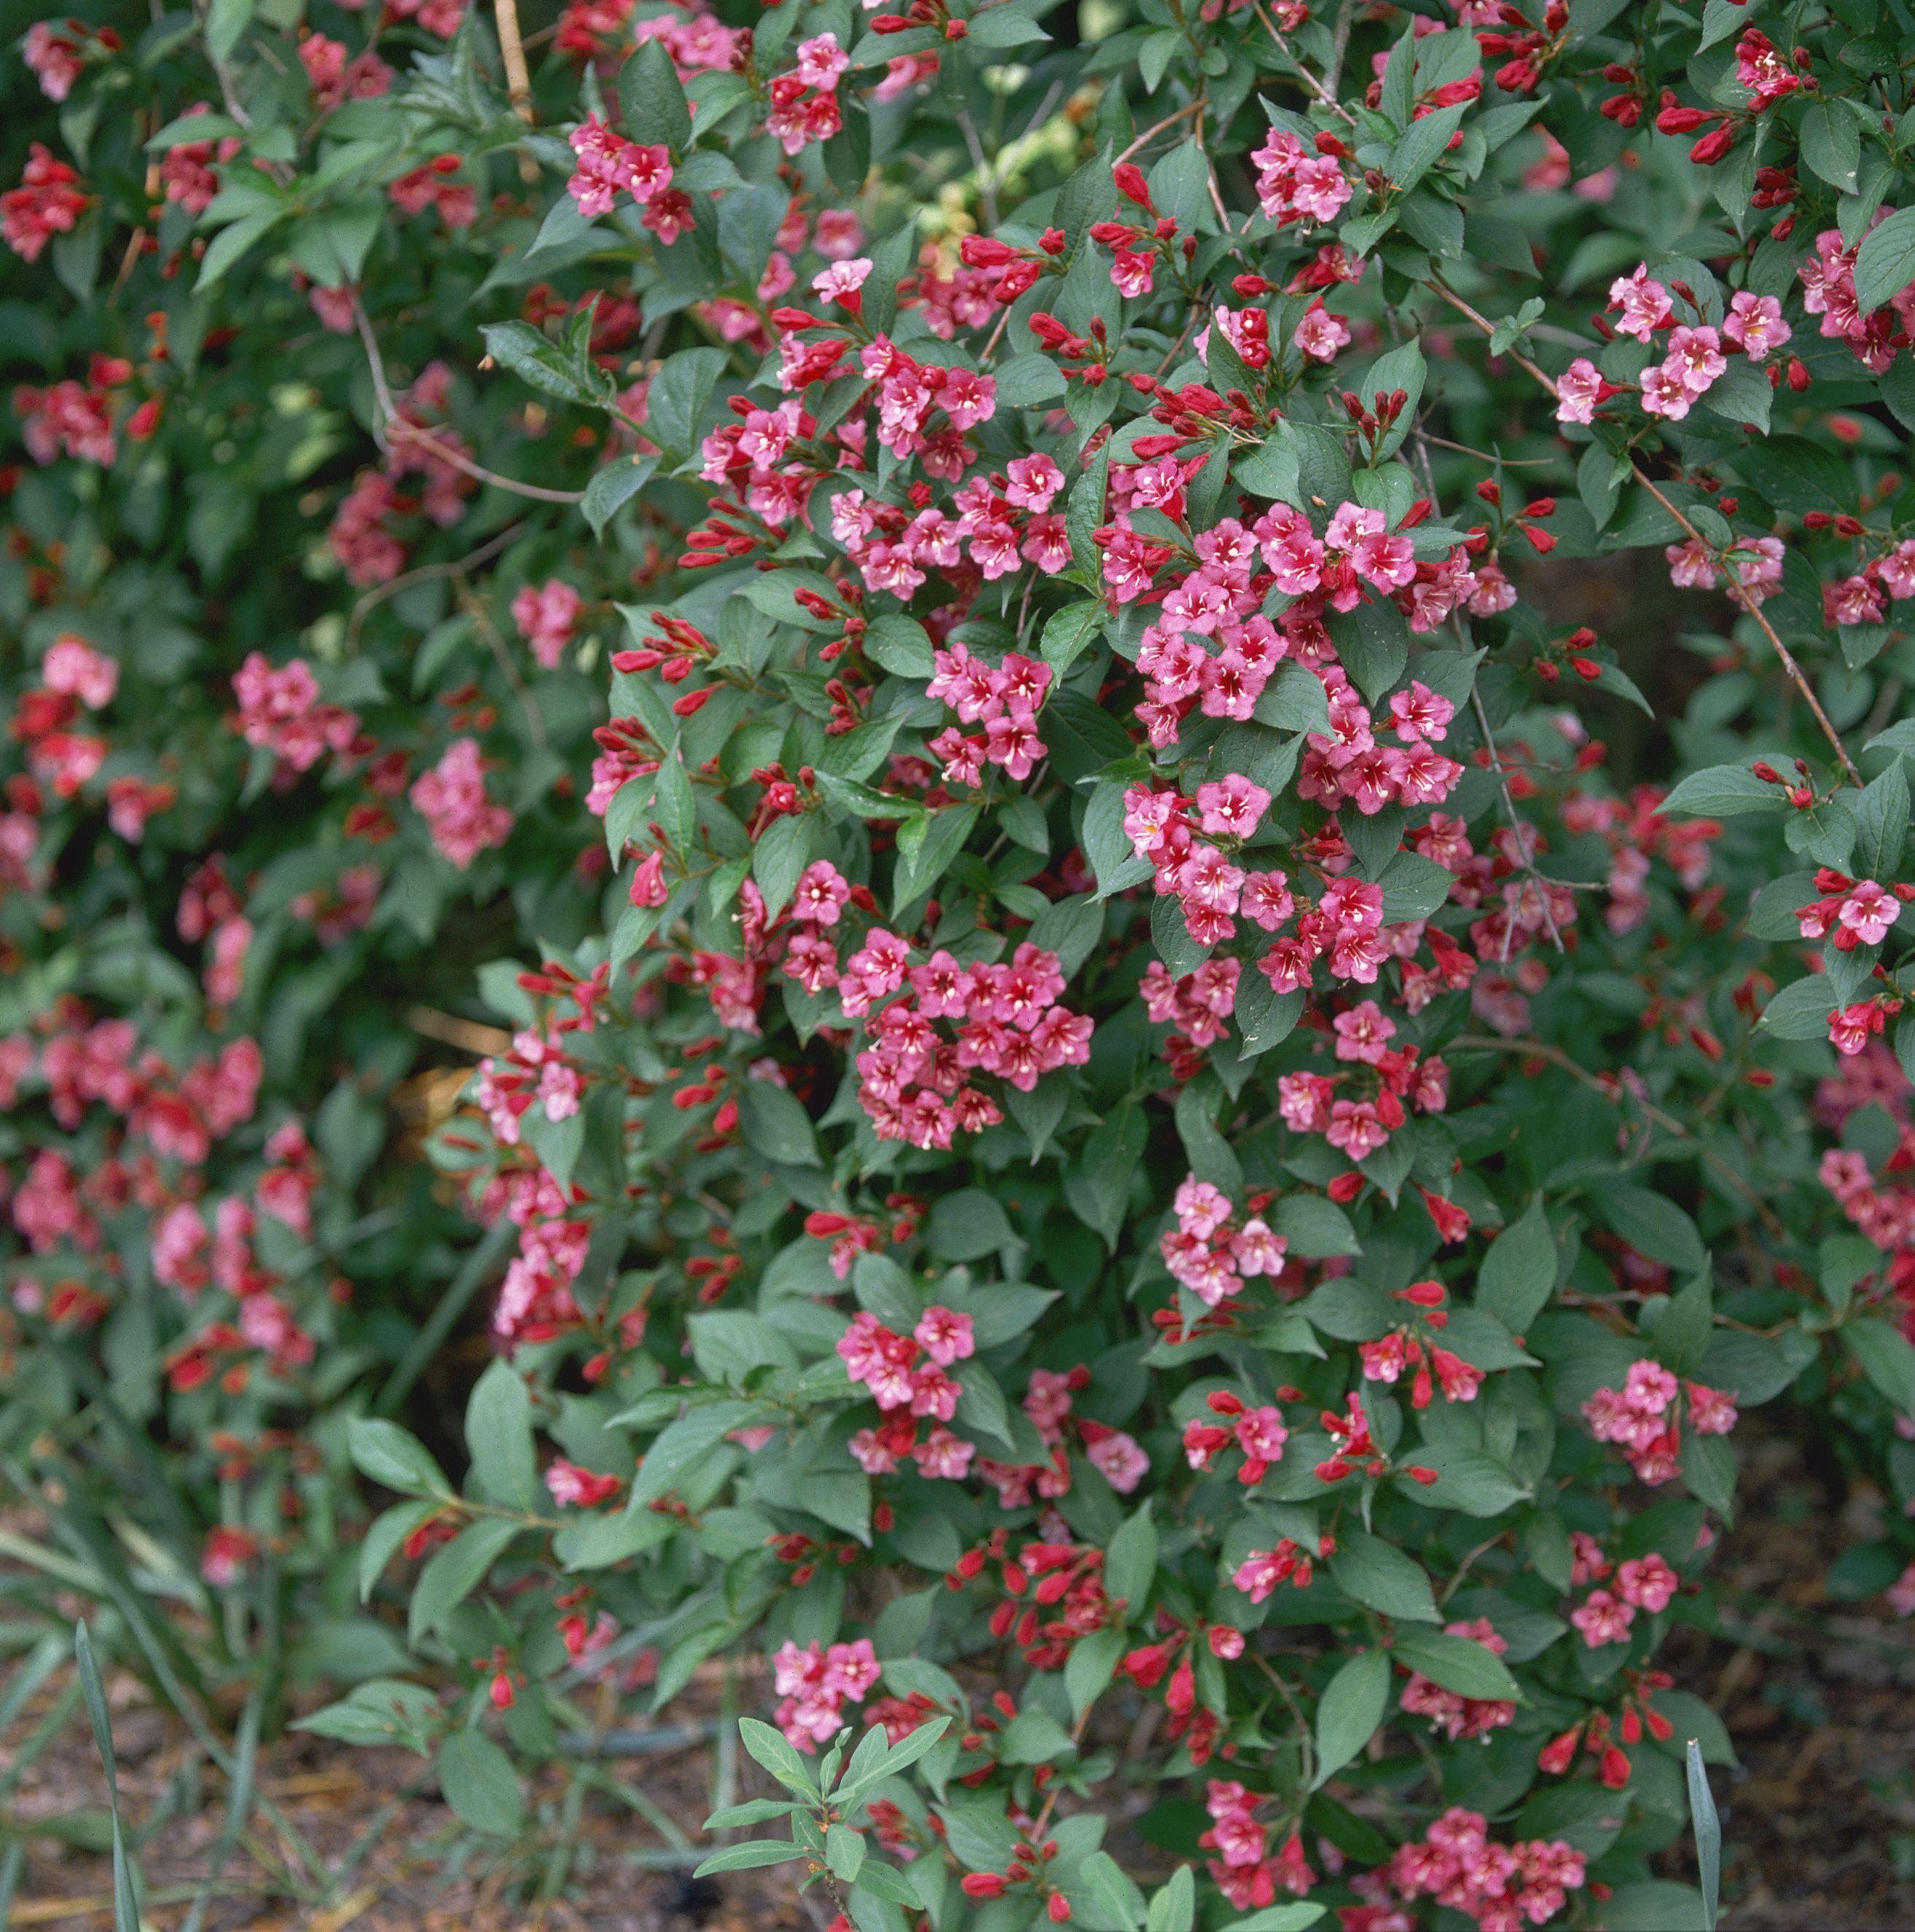 Foliage and Flowers of Weigela